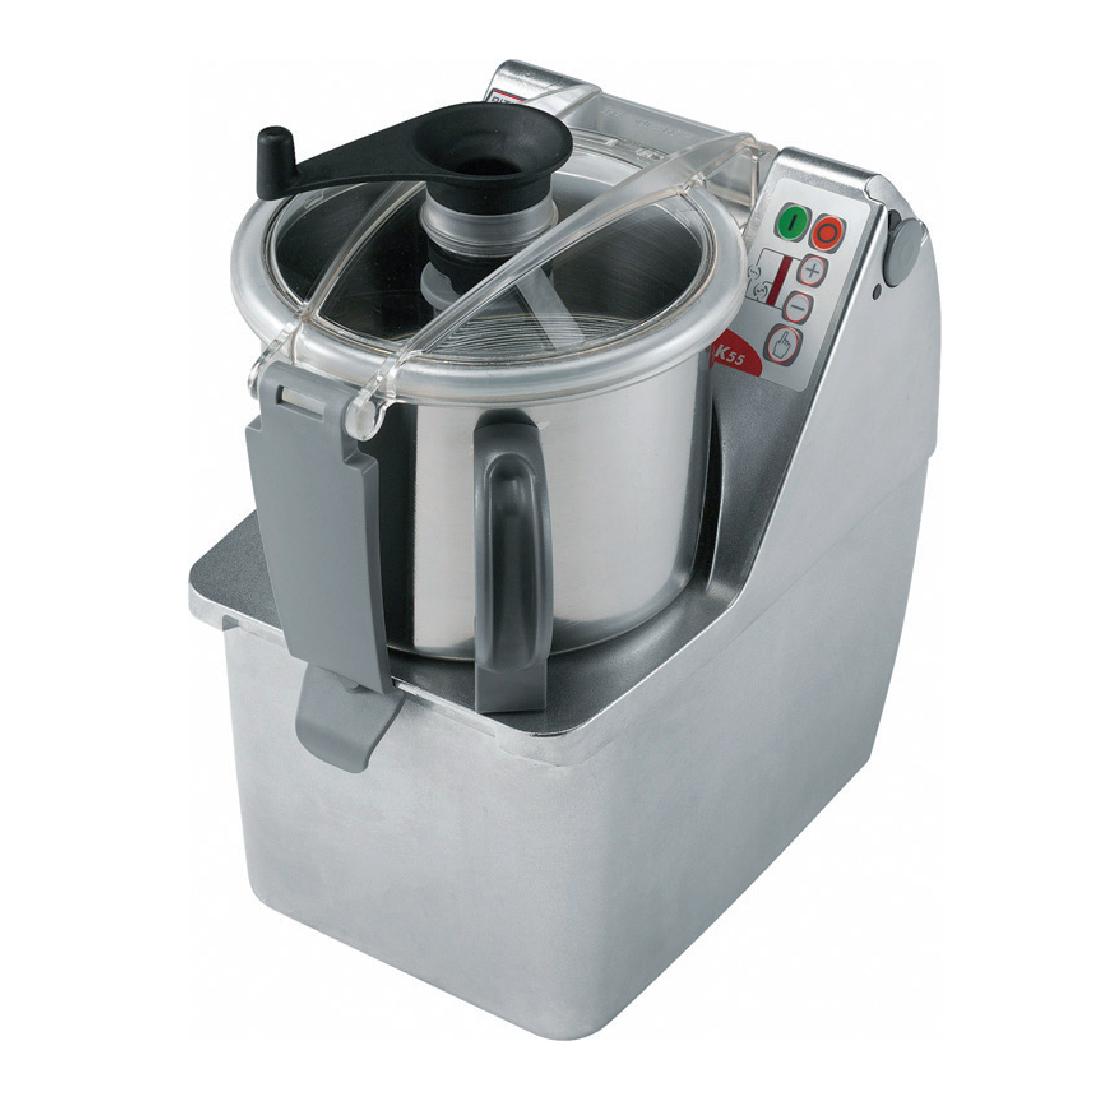 Dito Sama Food processor 4.5 litre single speed - K45